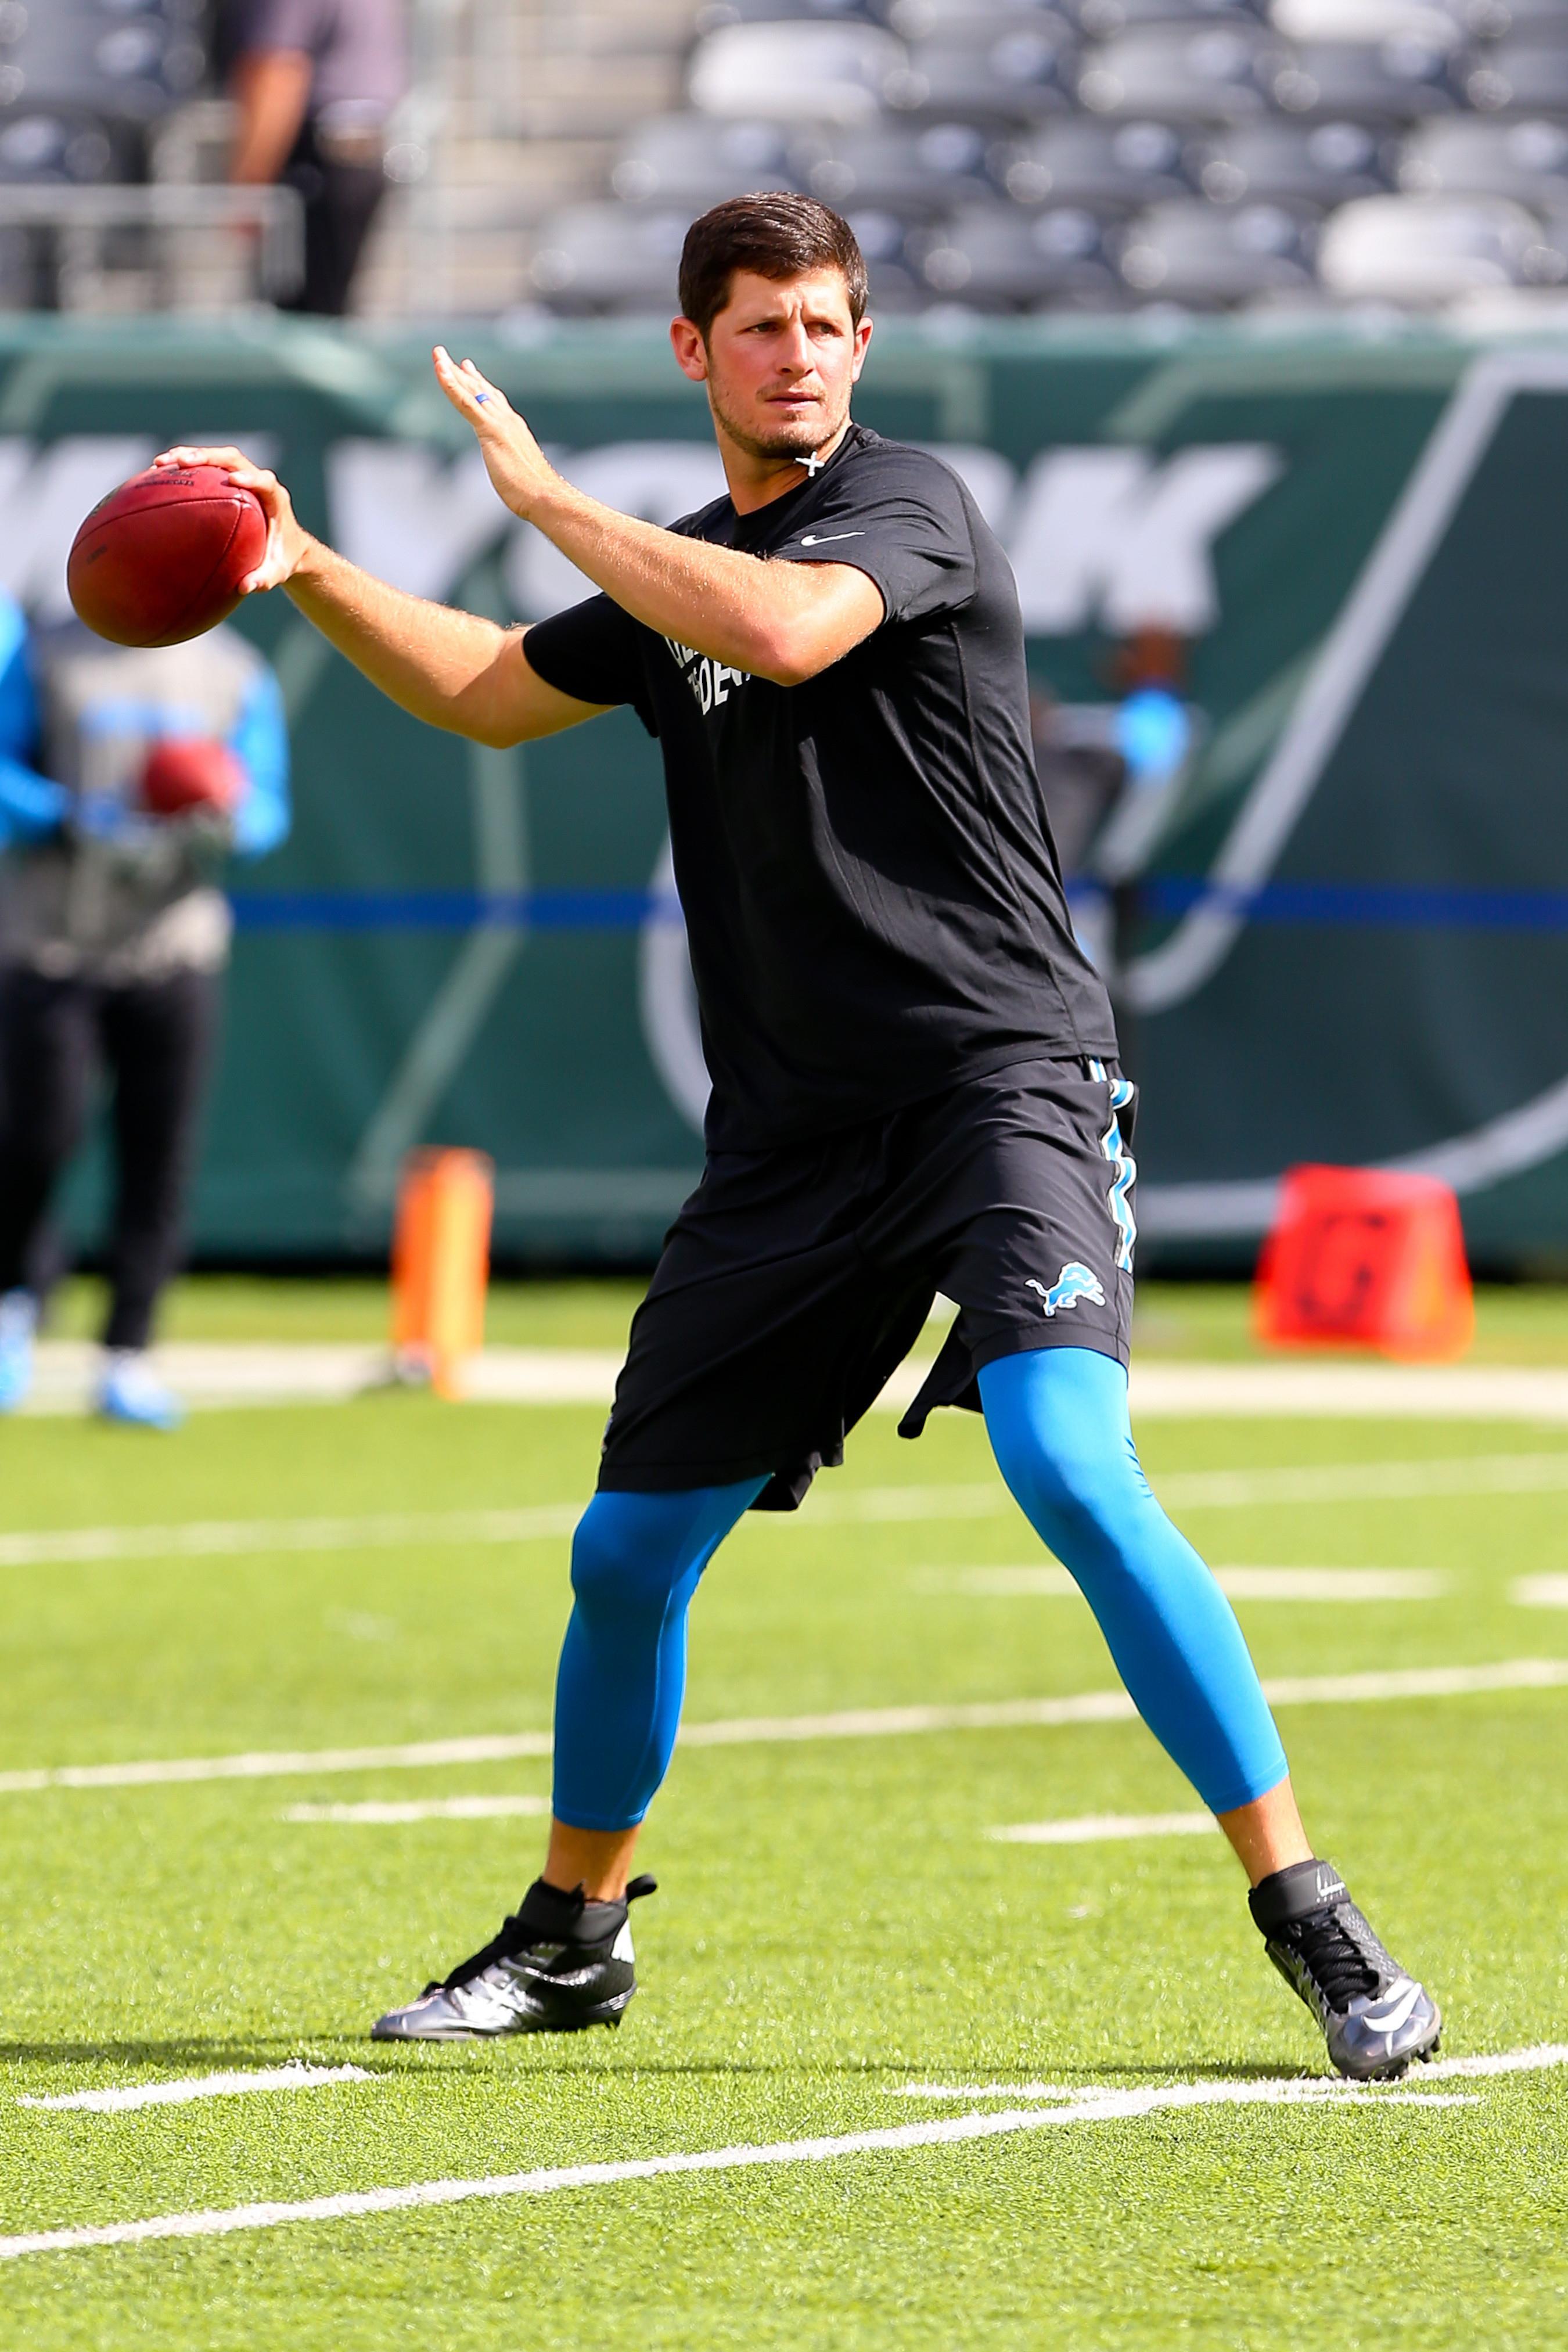 NFL: SEP 28 Lions at Jets